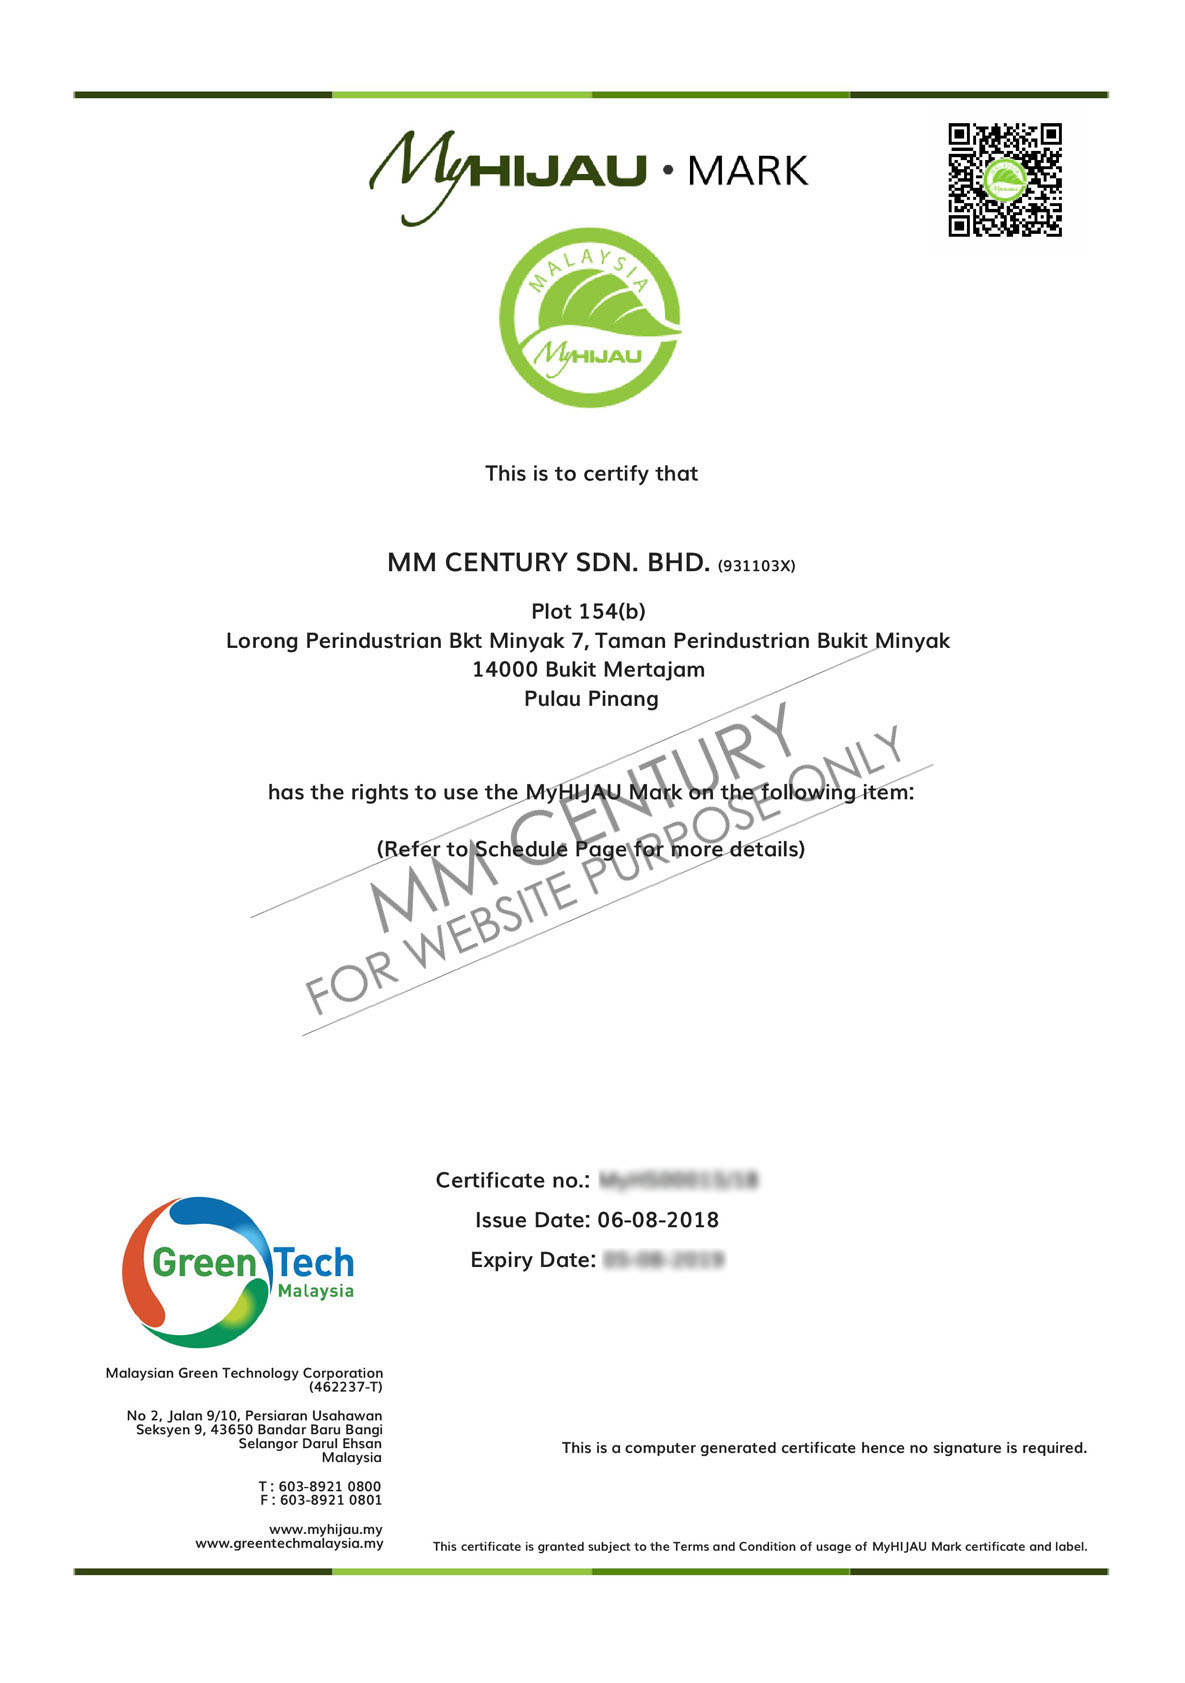 MM Century- MyHIJAU Certificate, Green Tech Malaysia